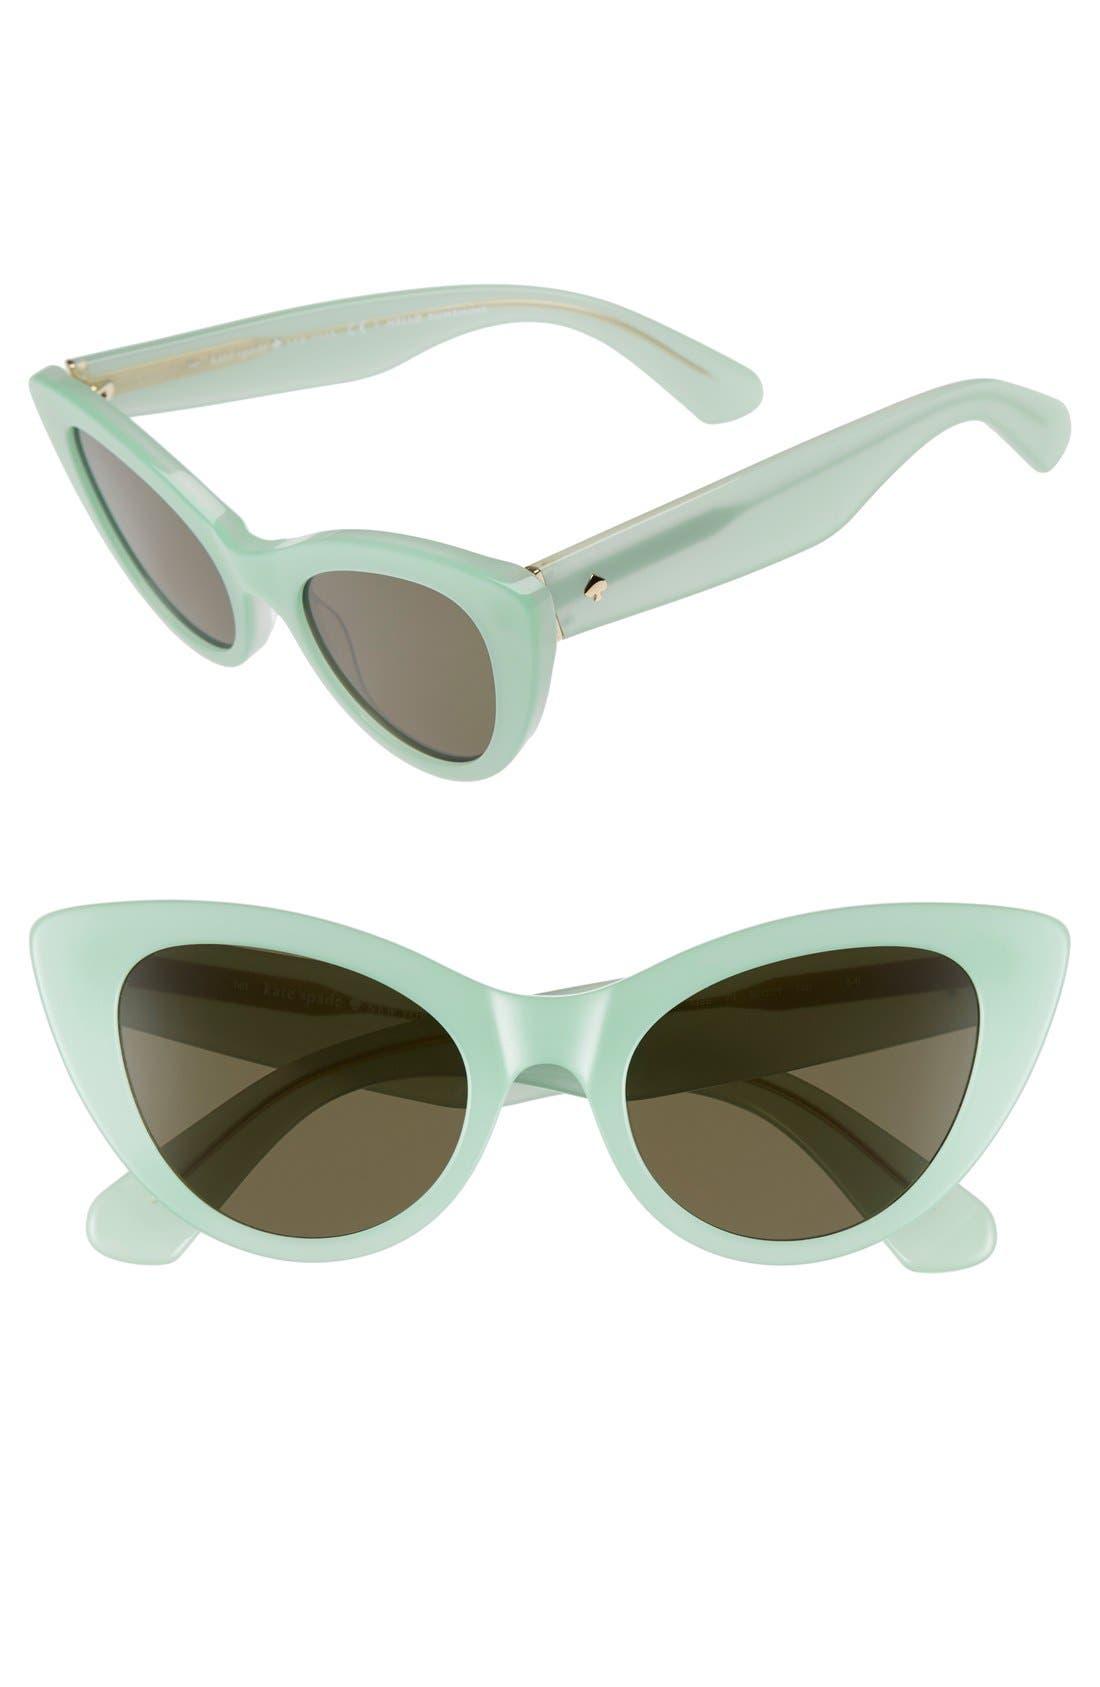 Main Image - kate spade new york 'deandra' 50mm cat eye sunglasses